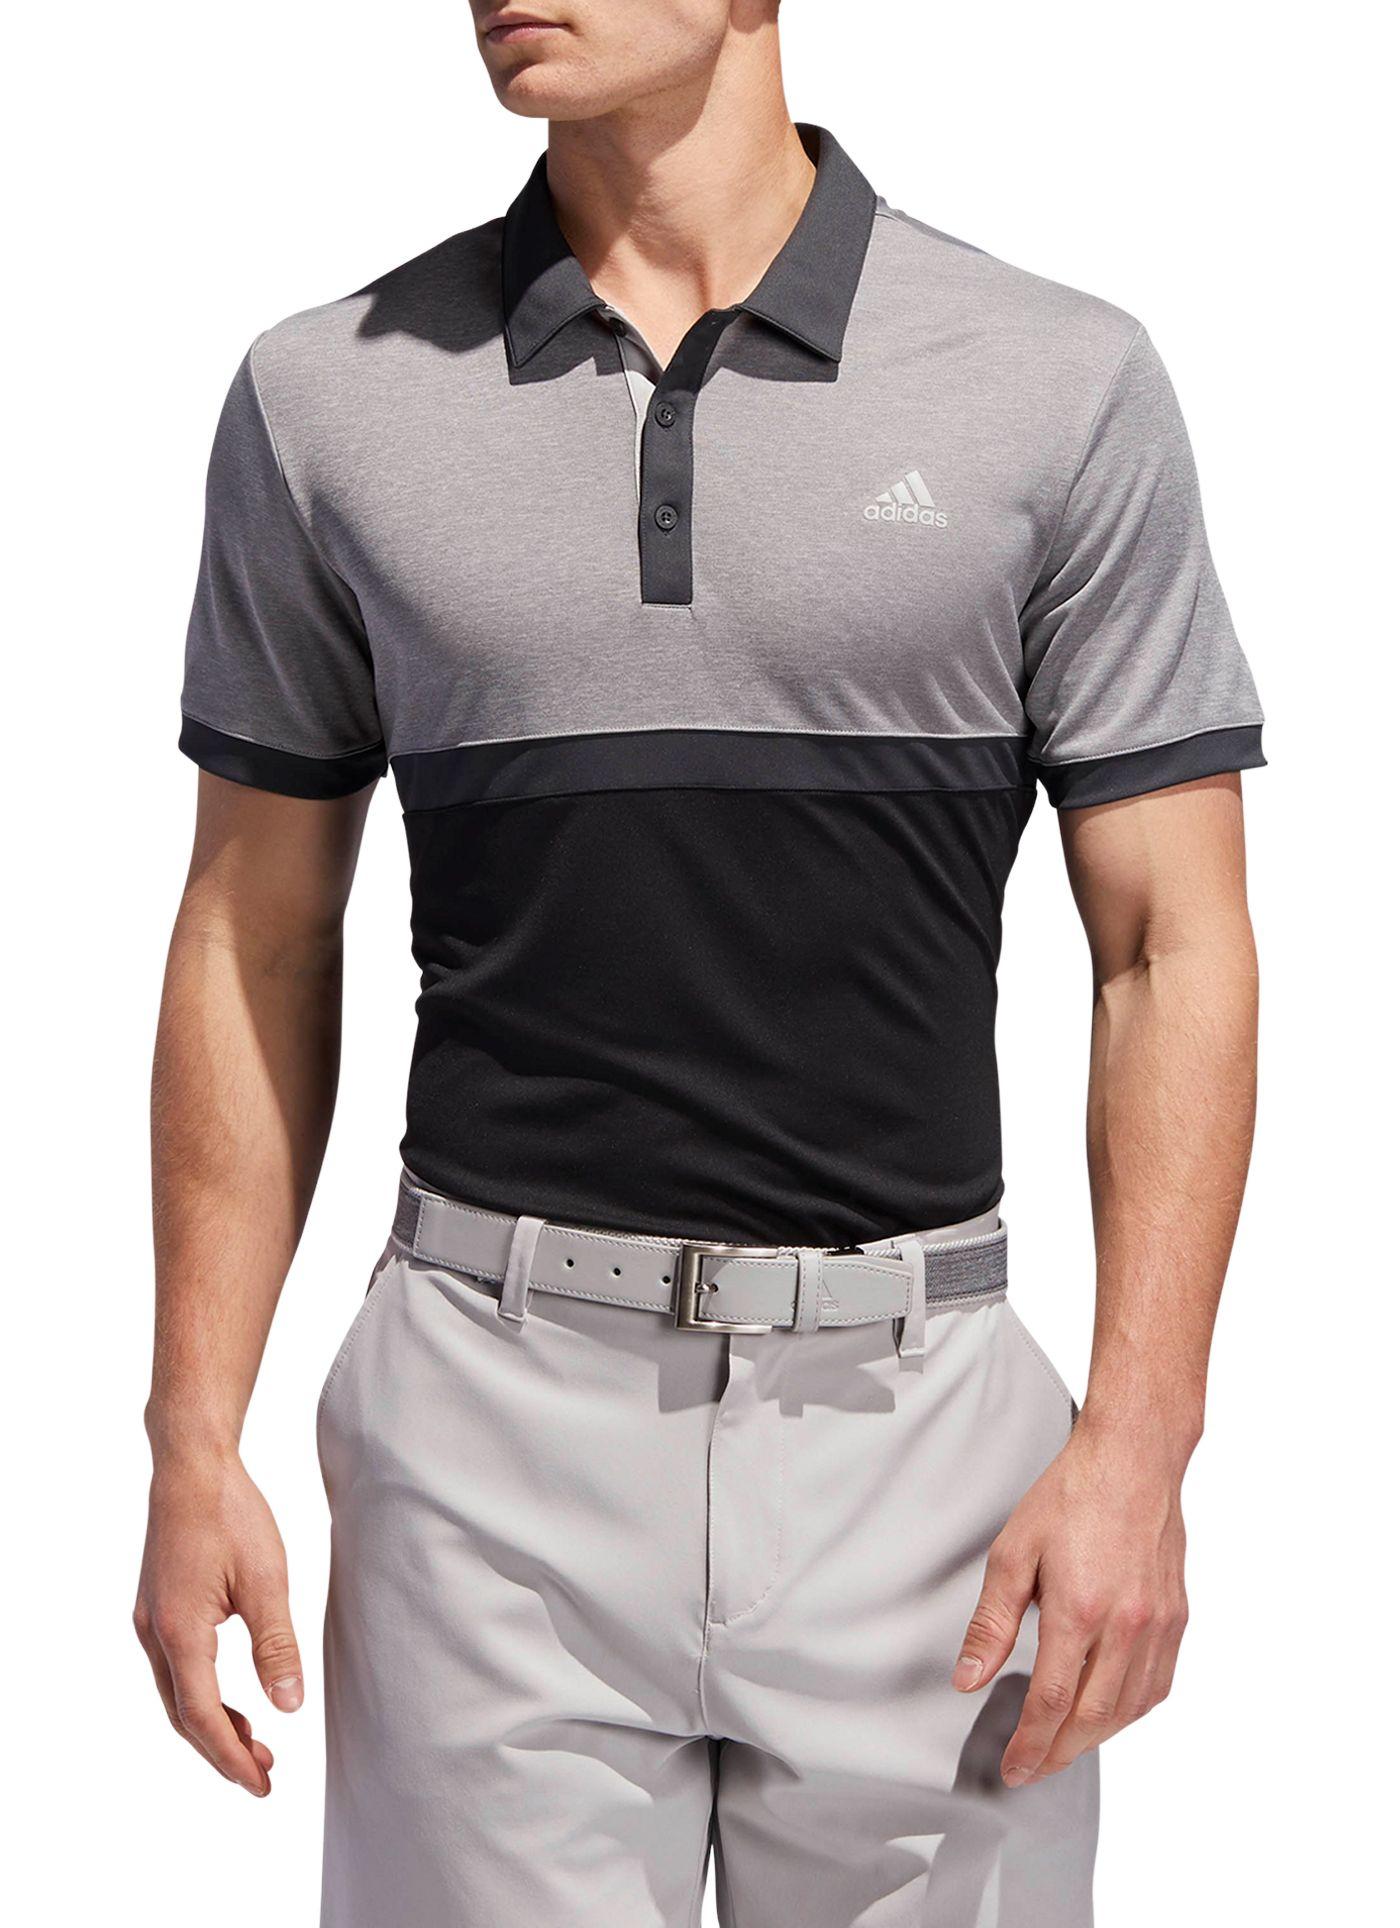 adidas Men's Drive Heather Colorblock Golf Polo